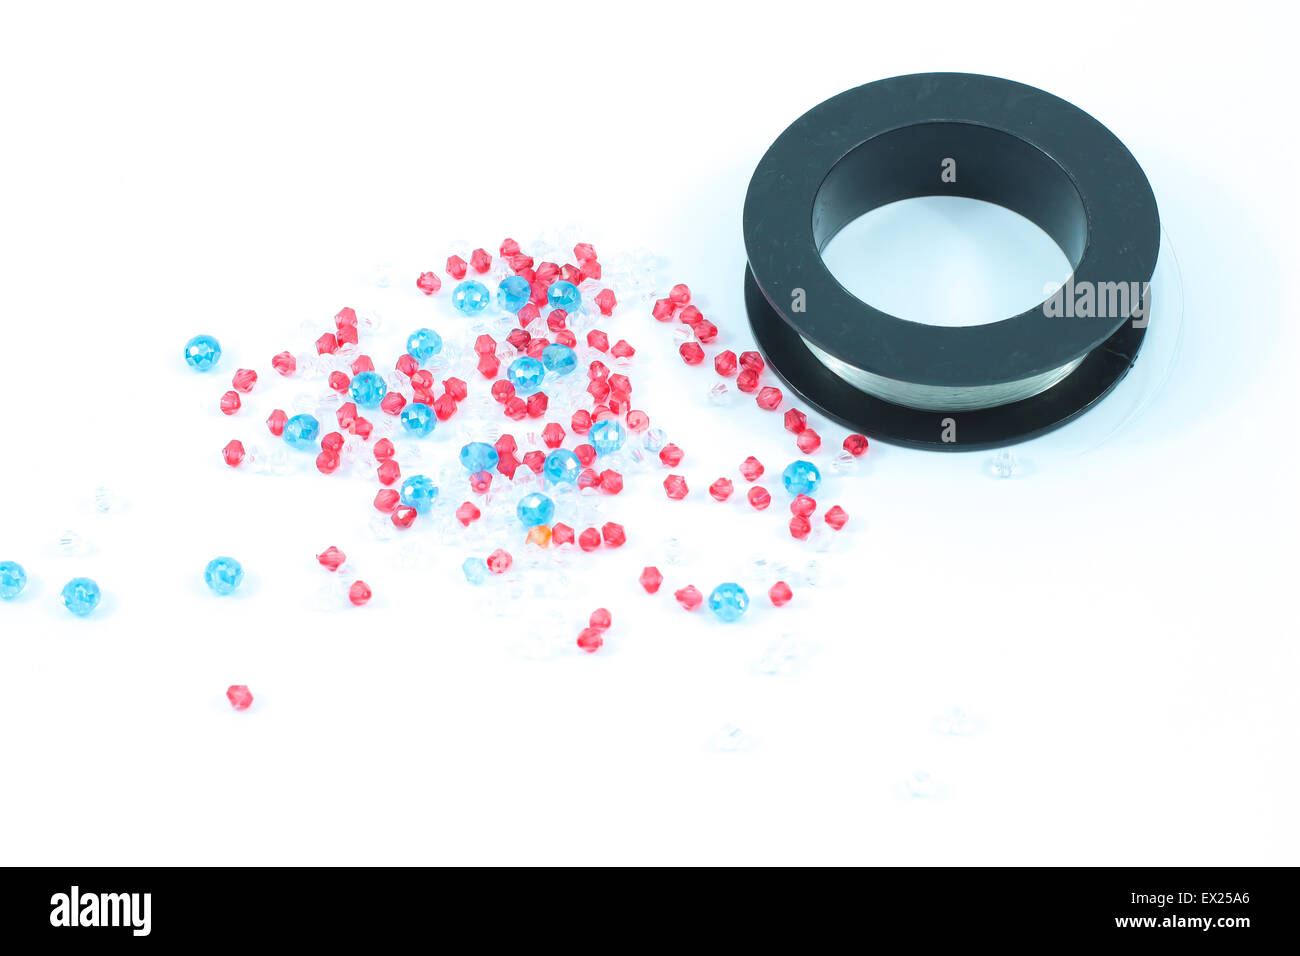 glass beads - Stock Image